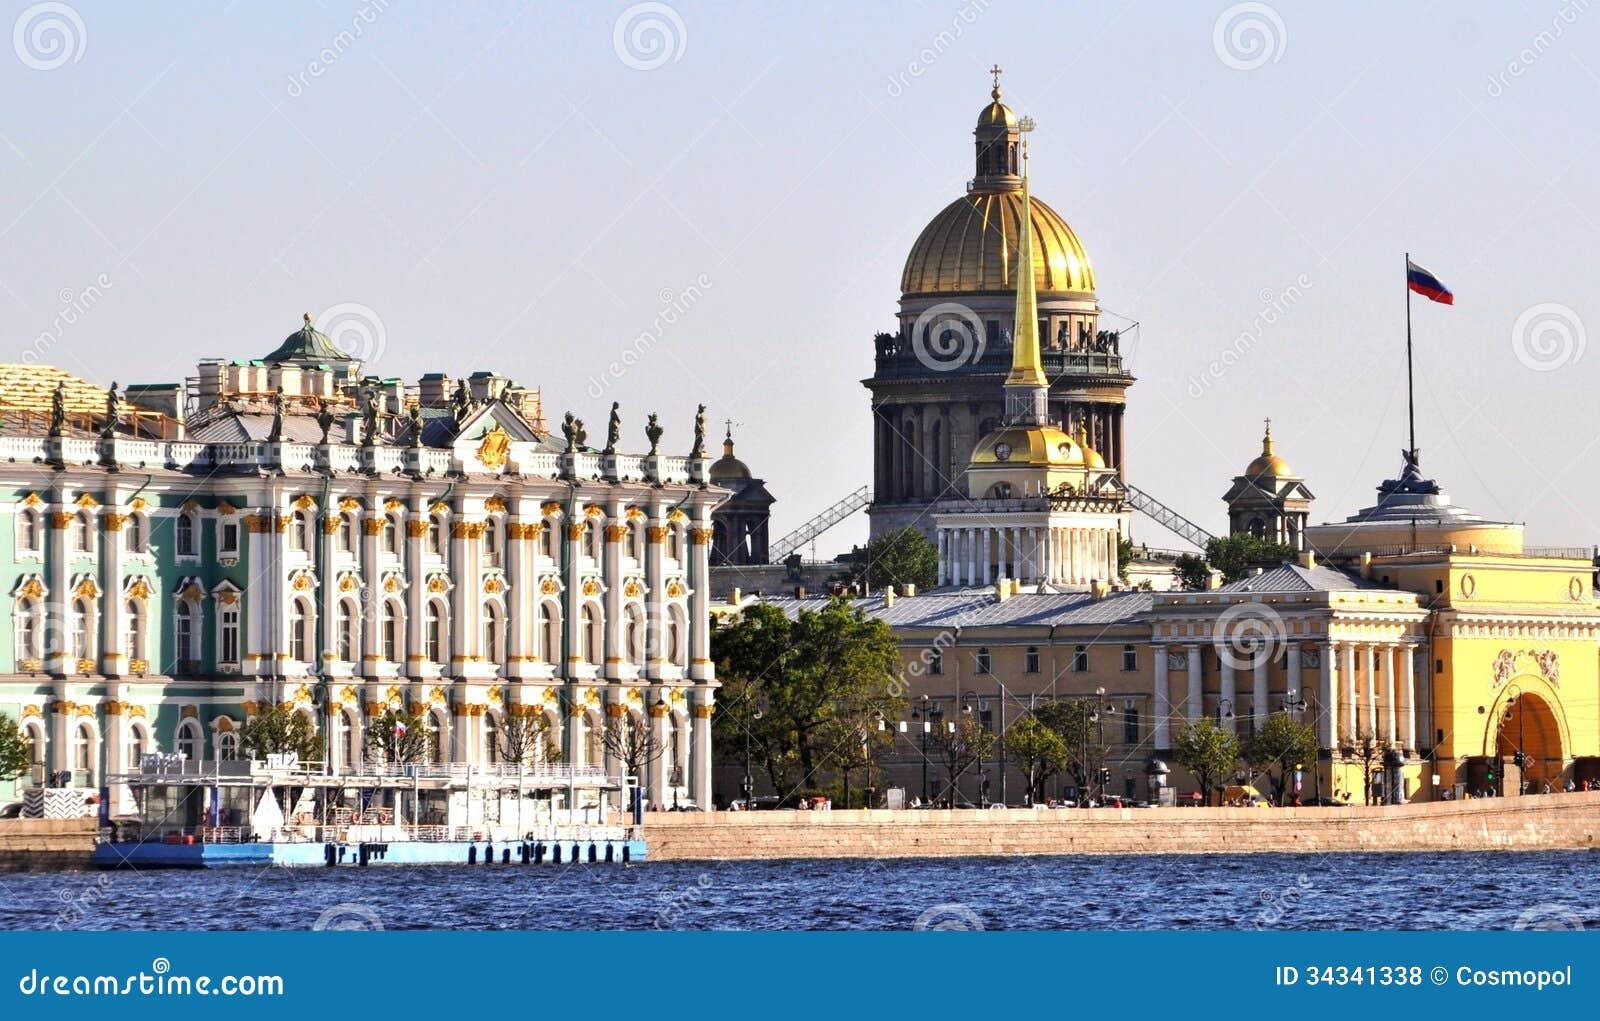 Landmark buildings st petersburg russia stock photo for Famous landmarks in russia